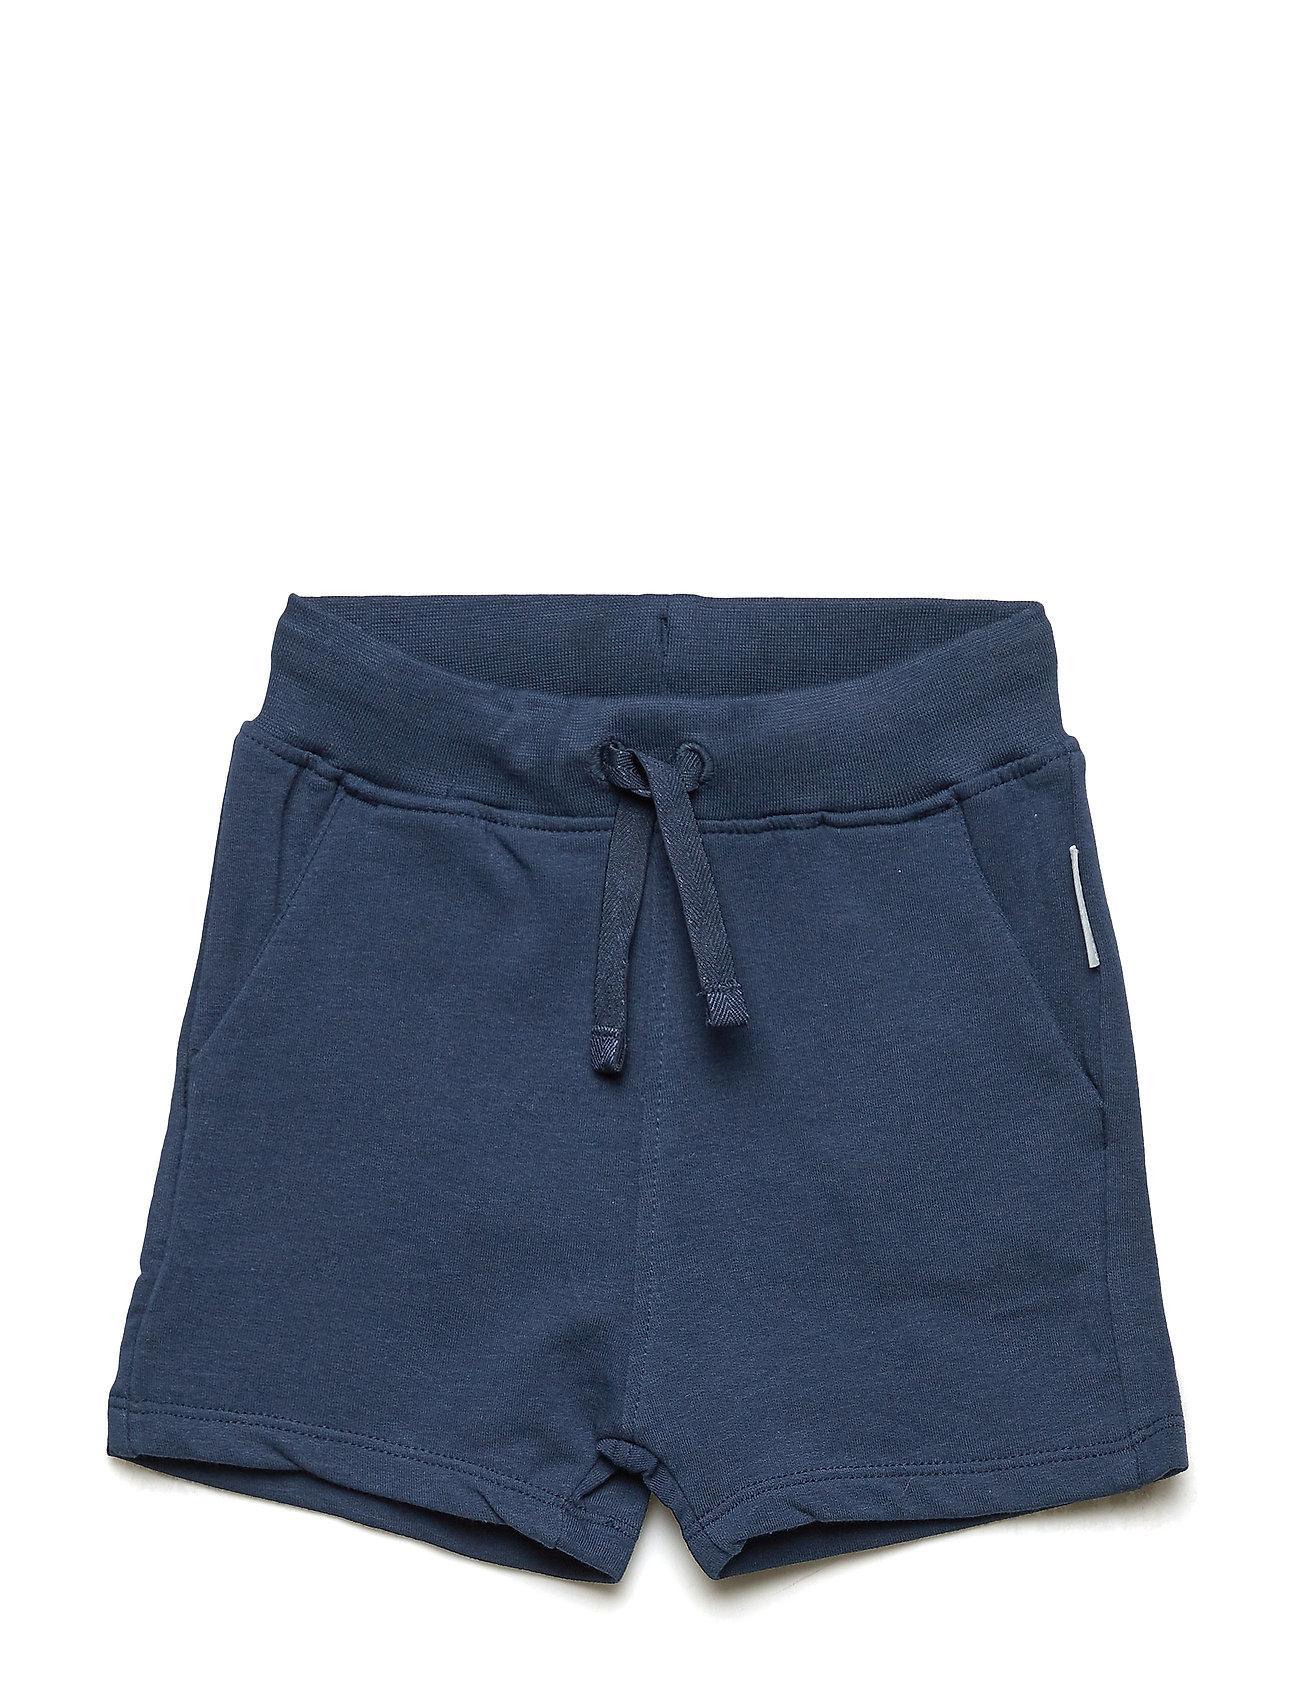 Polarn O. Pyret Shorts Jersey Baby